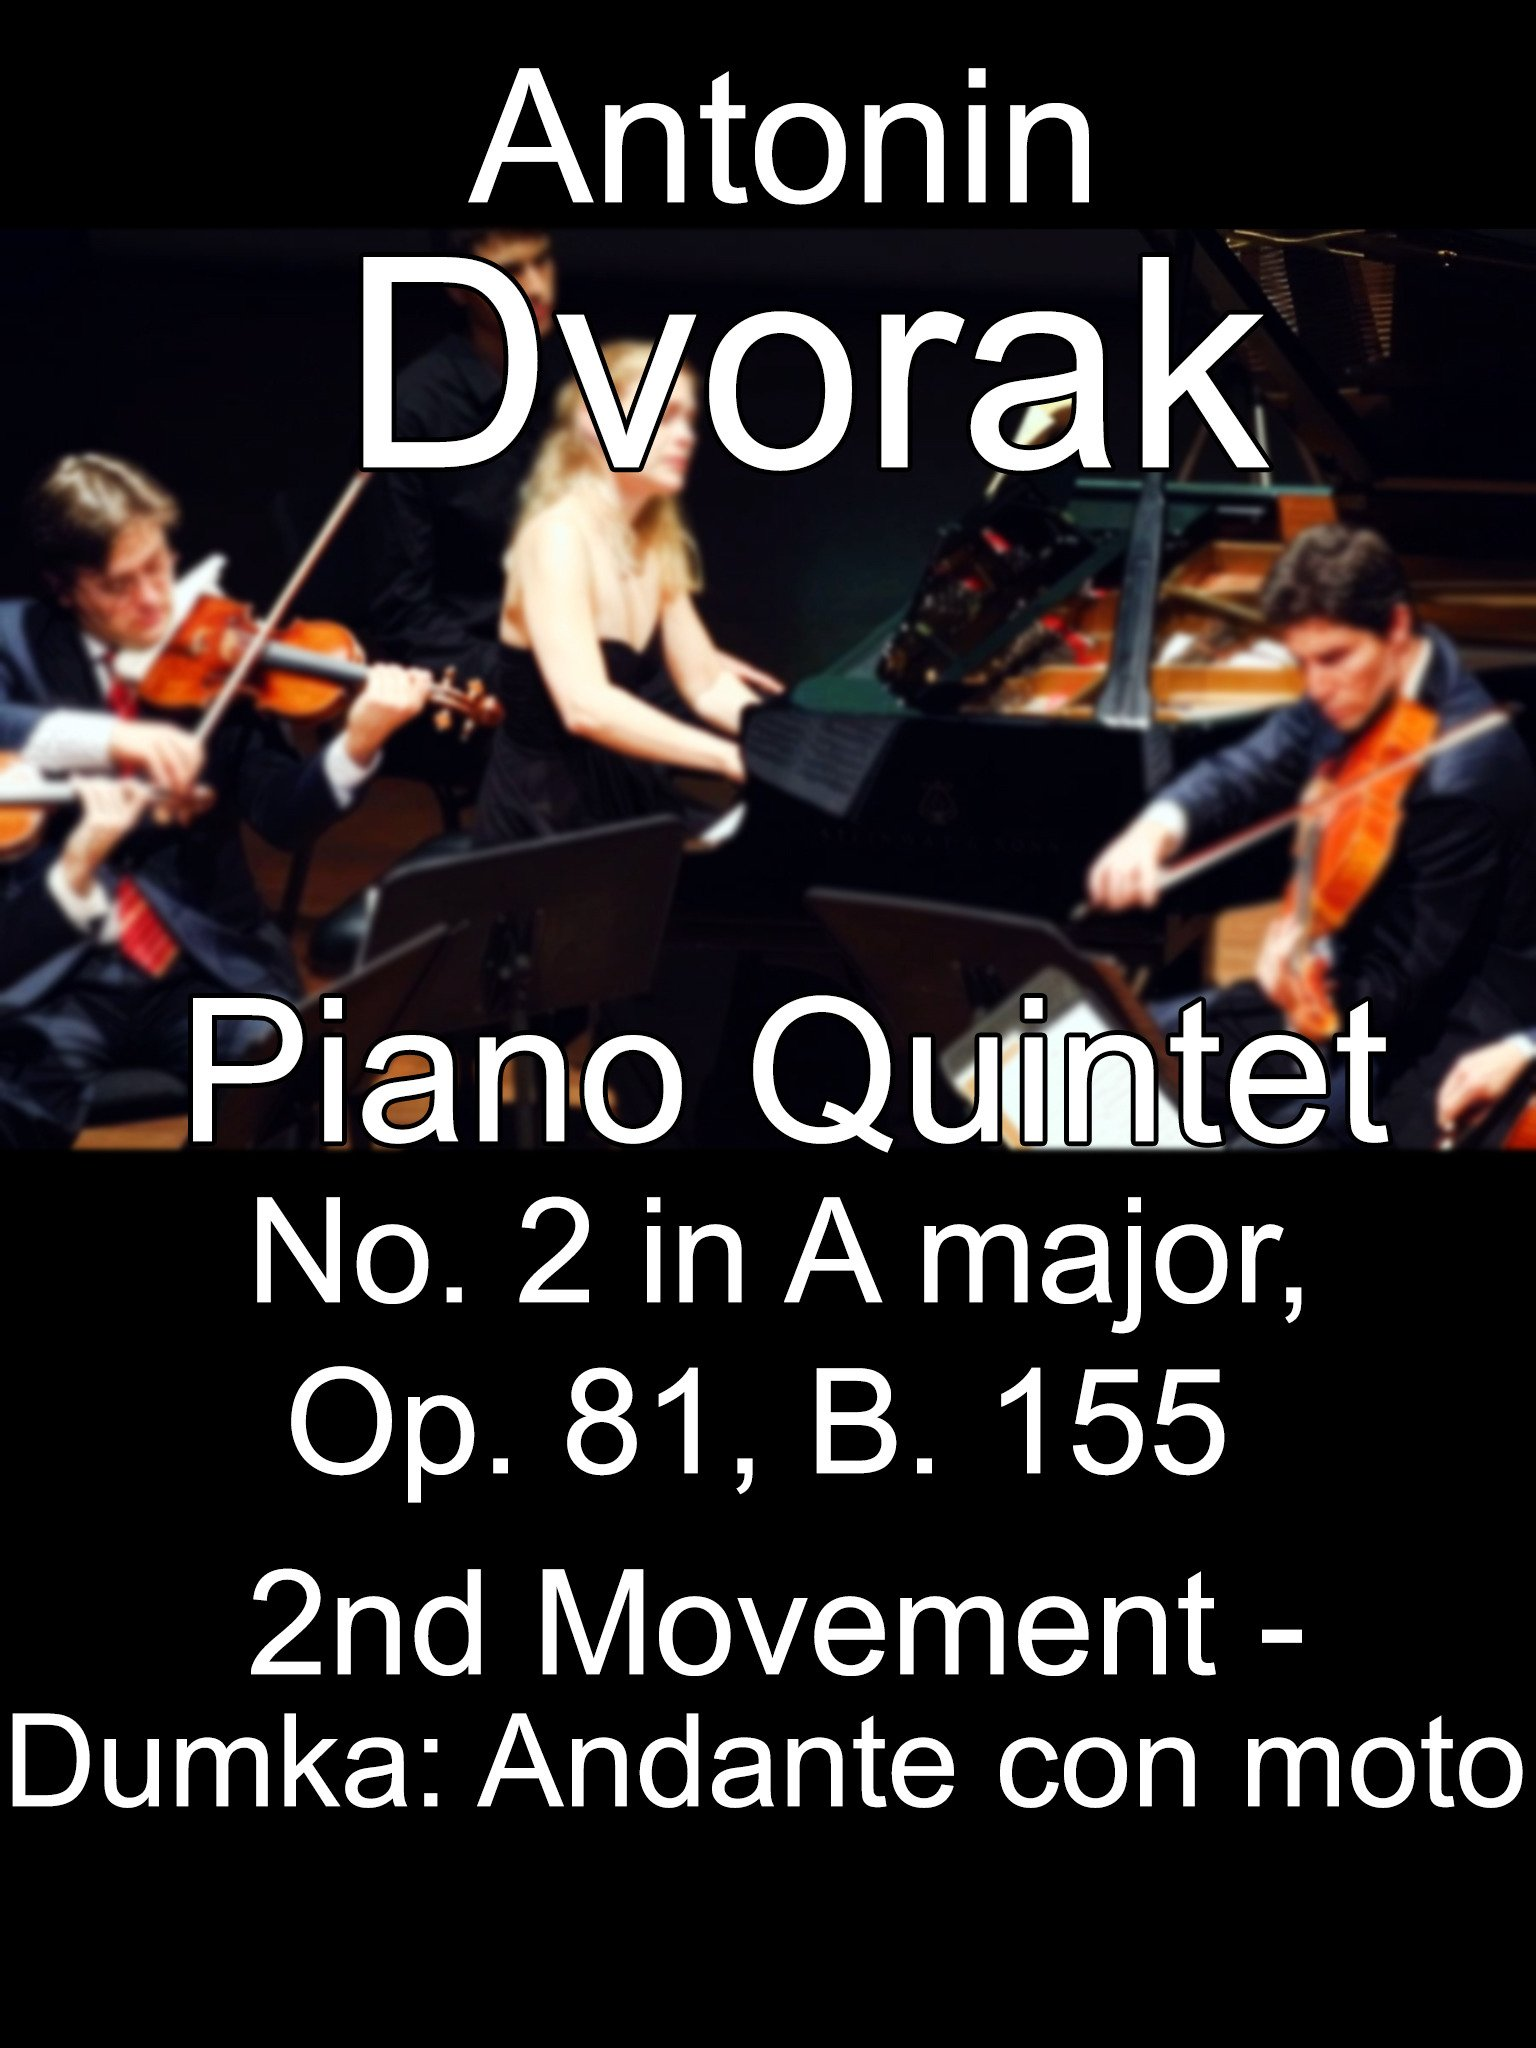 Piano Quintet No. 2 in A major, Op. 81, B. 155 by Antonin Dvorak, 2nd Movement